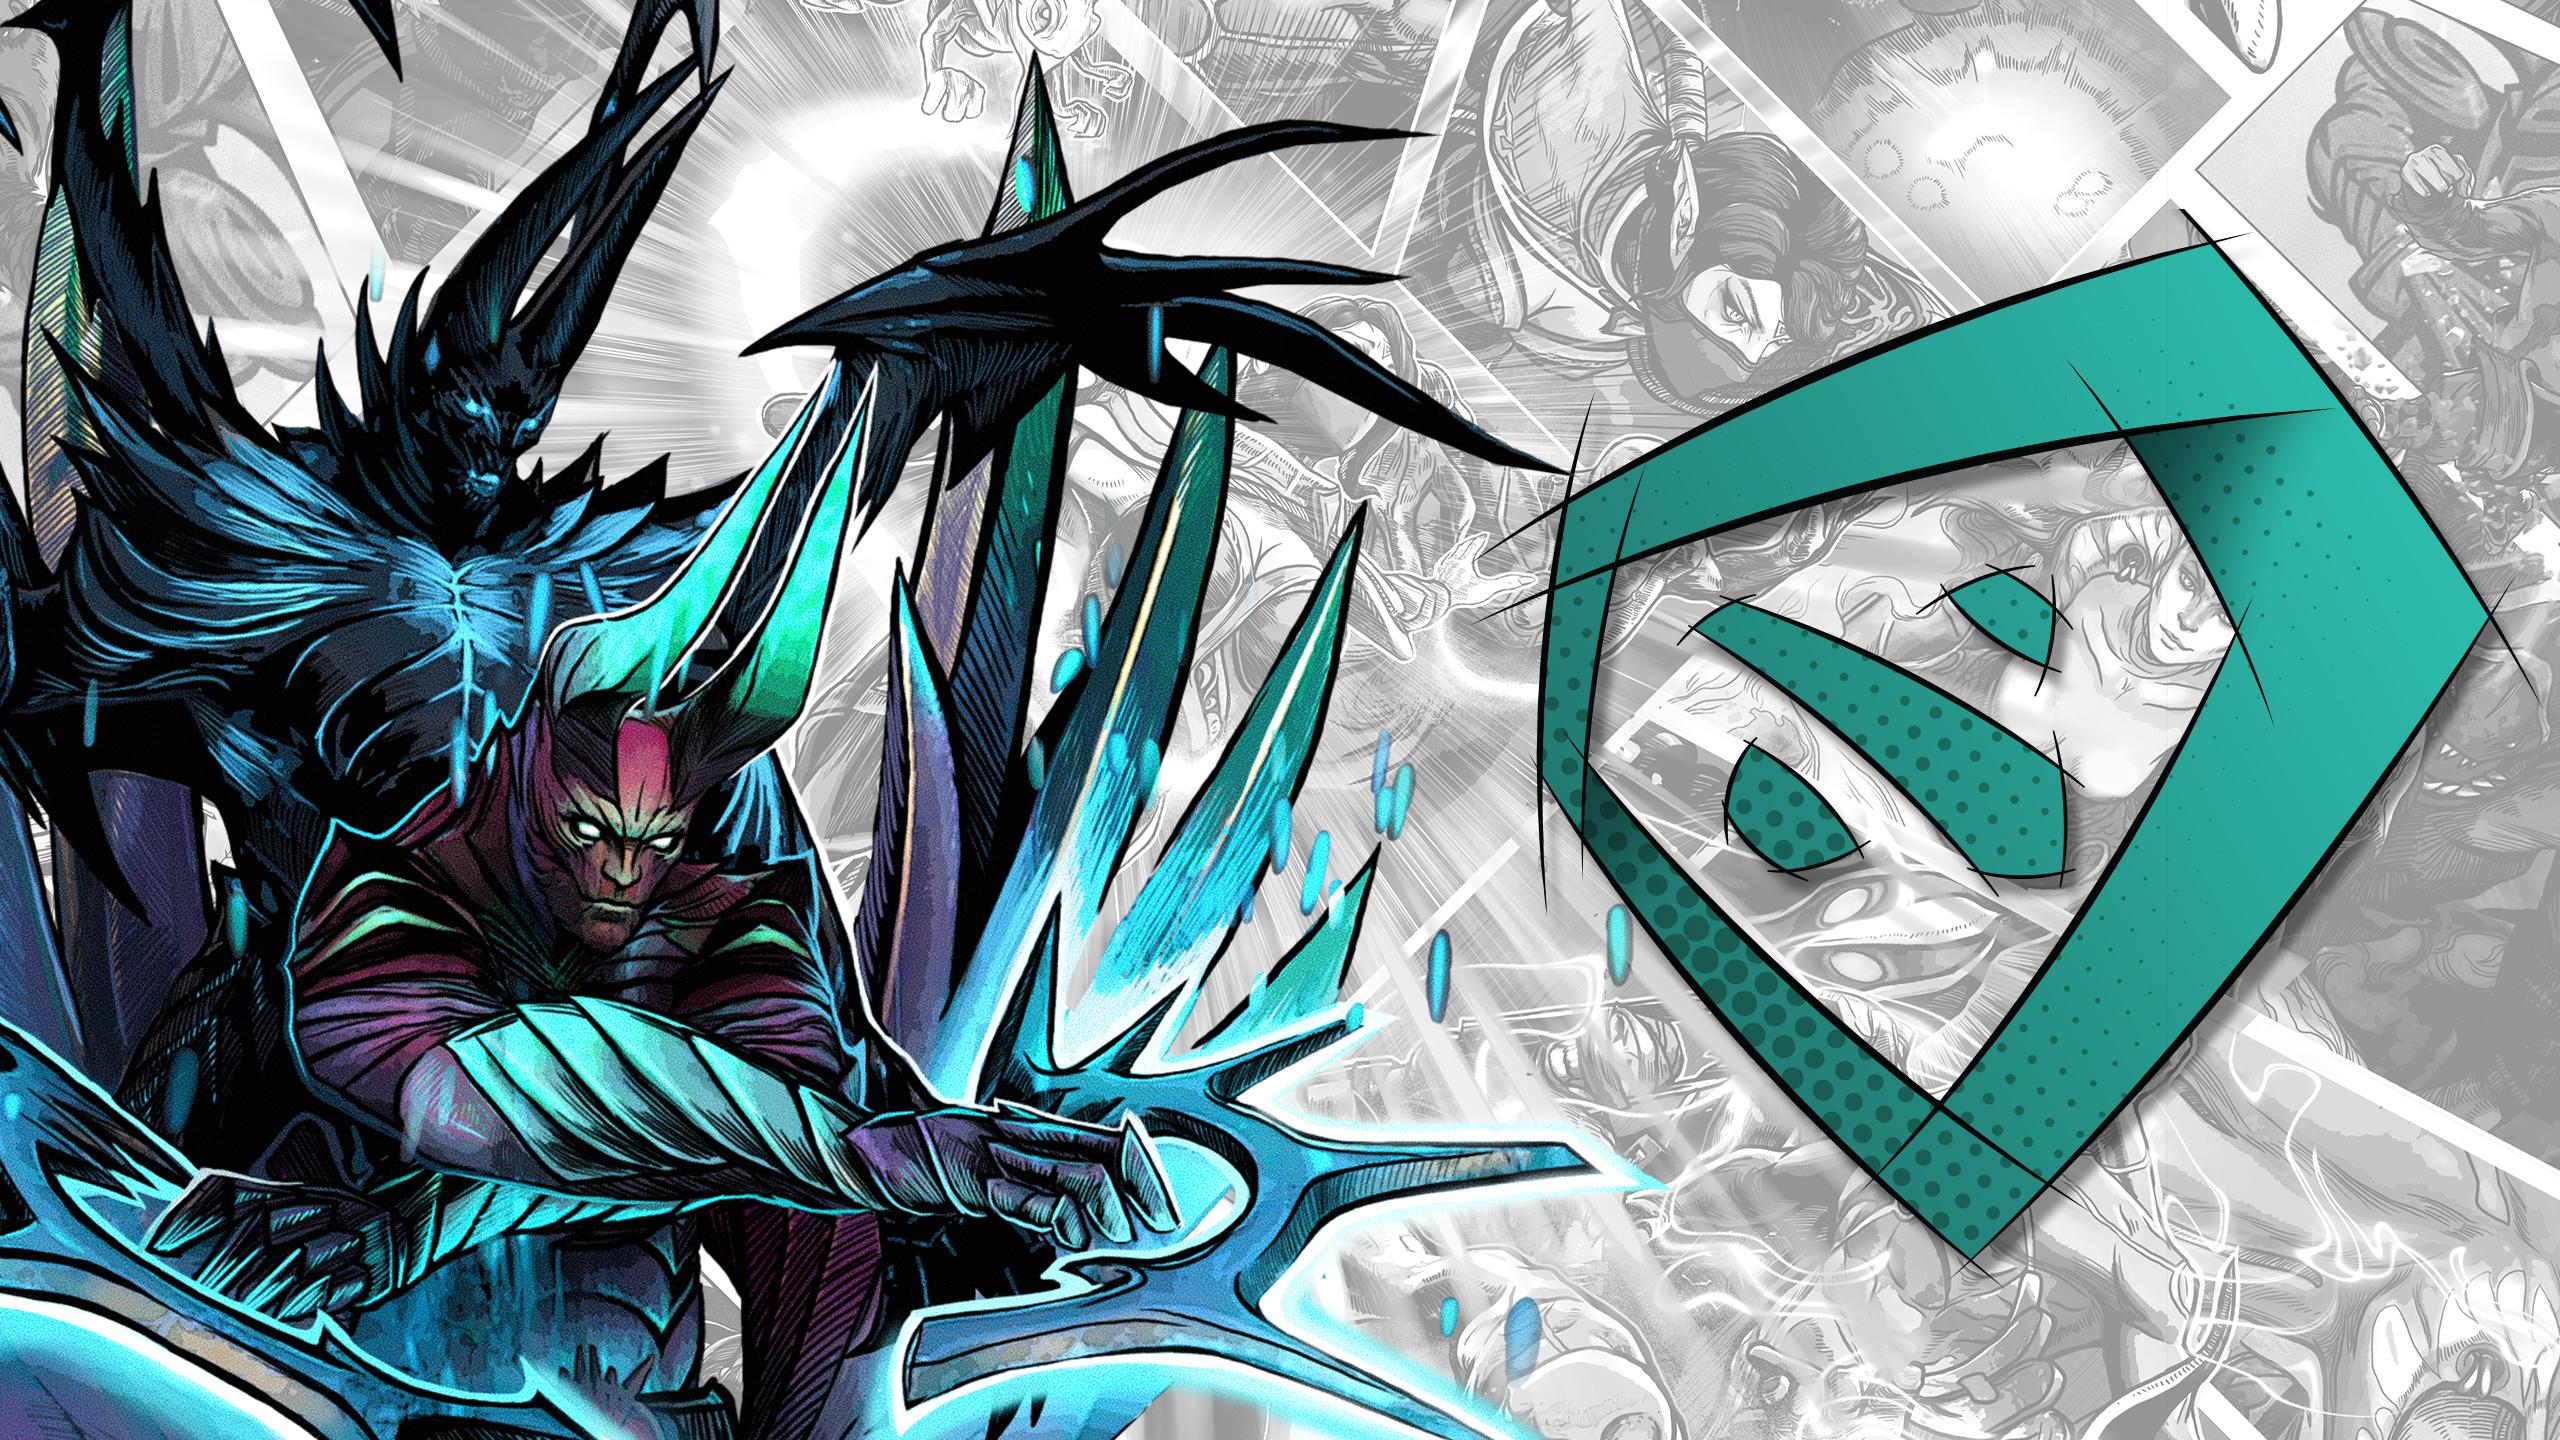 Defense Of The Ancients Terrorblade Dota 2 2560x1440